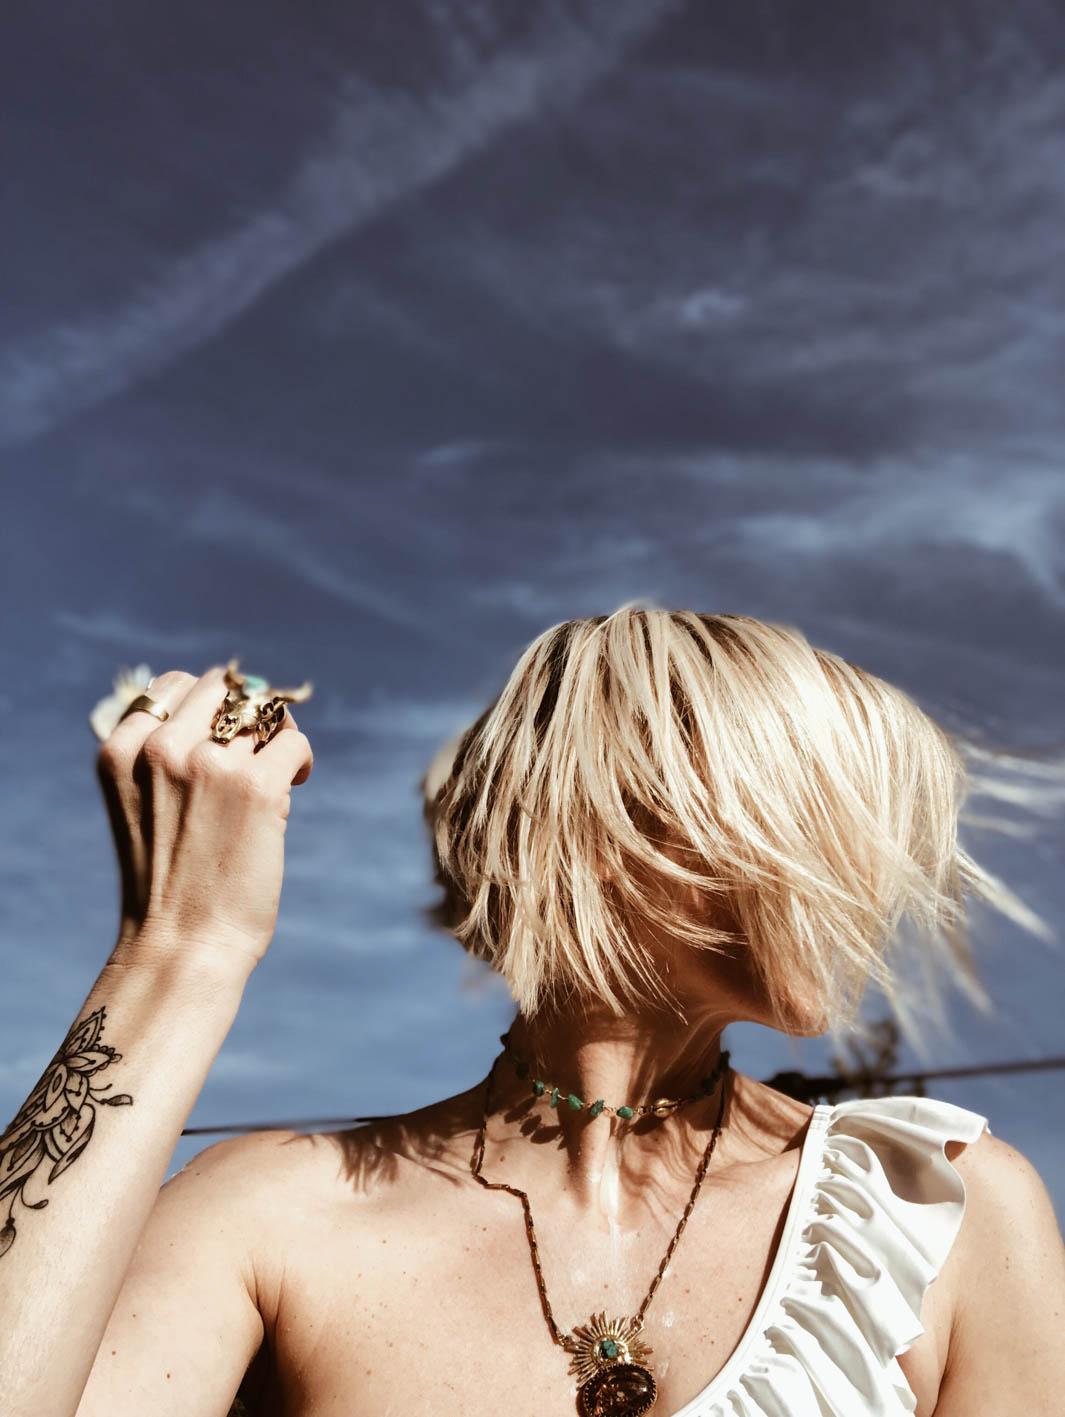 Carnet sauvage- blog mode et tendances - christina rose jewelry13.jpg